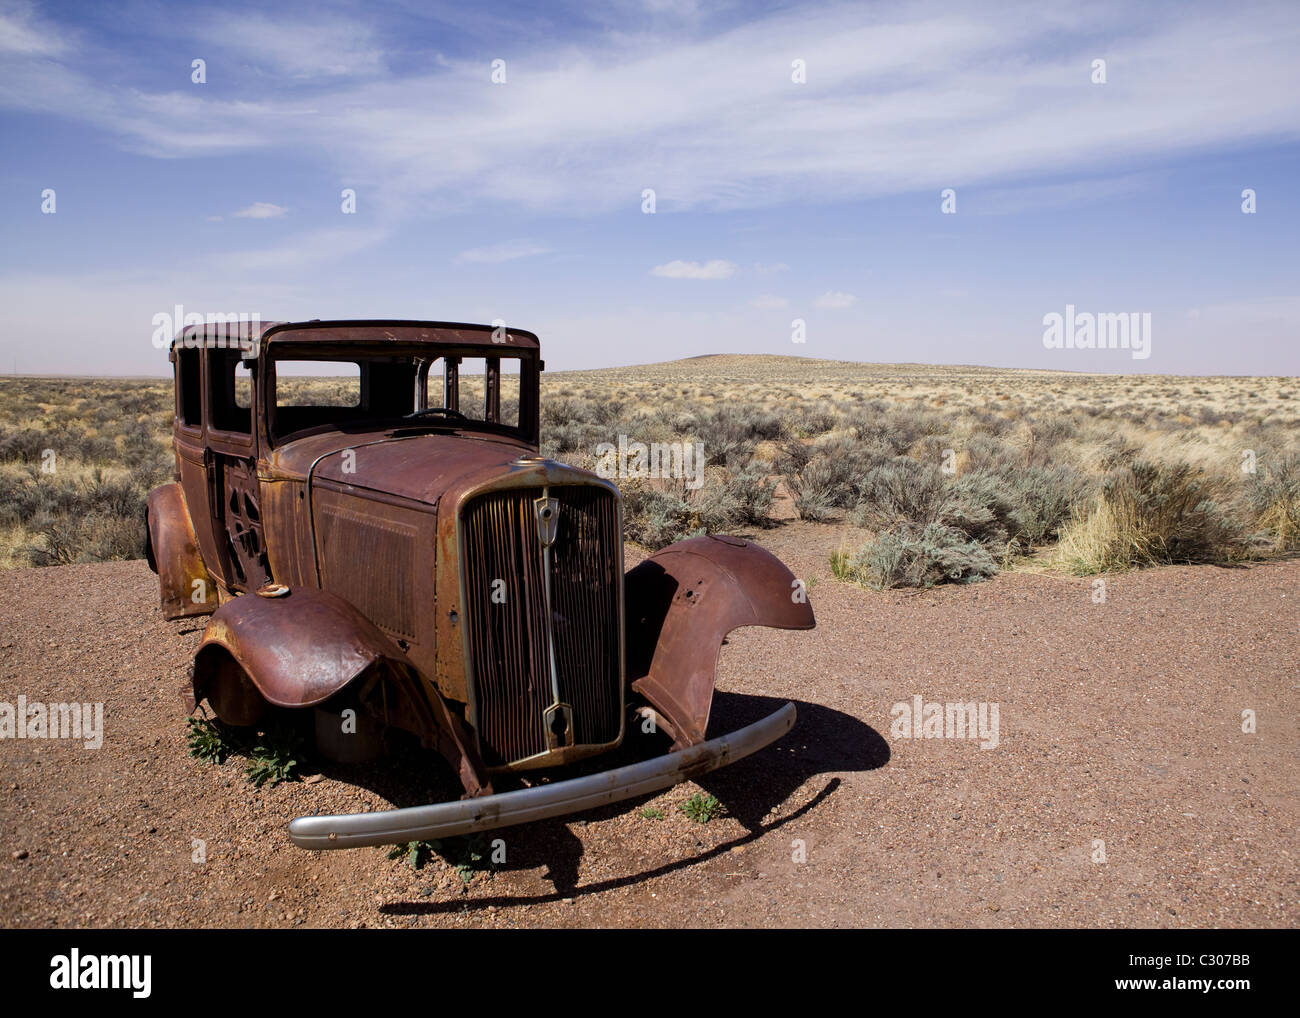 Deserted antique car in the North American desert landscape - Arizona USA - Stock Image